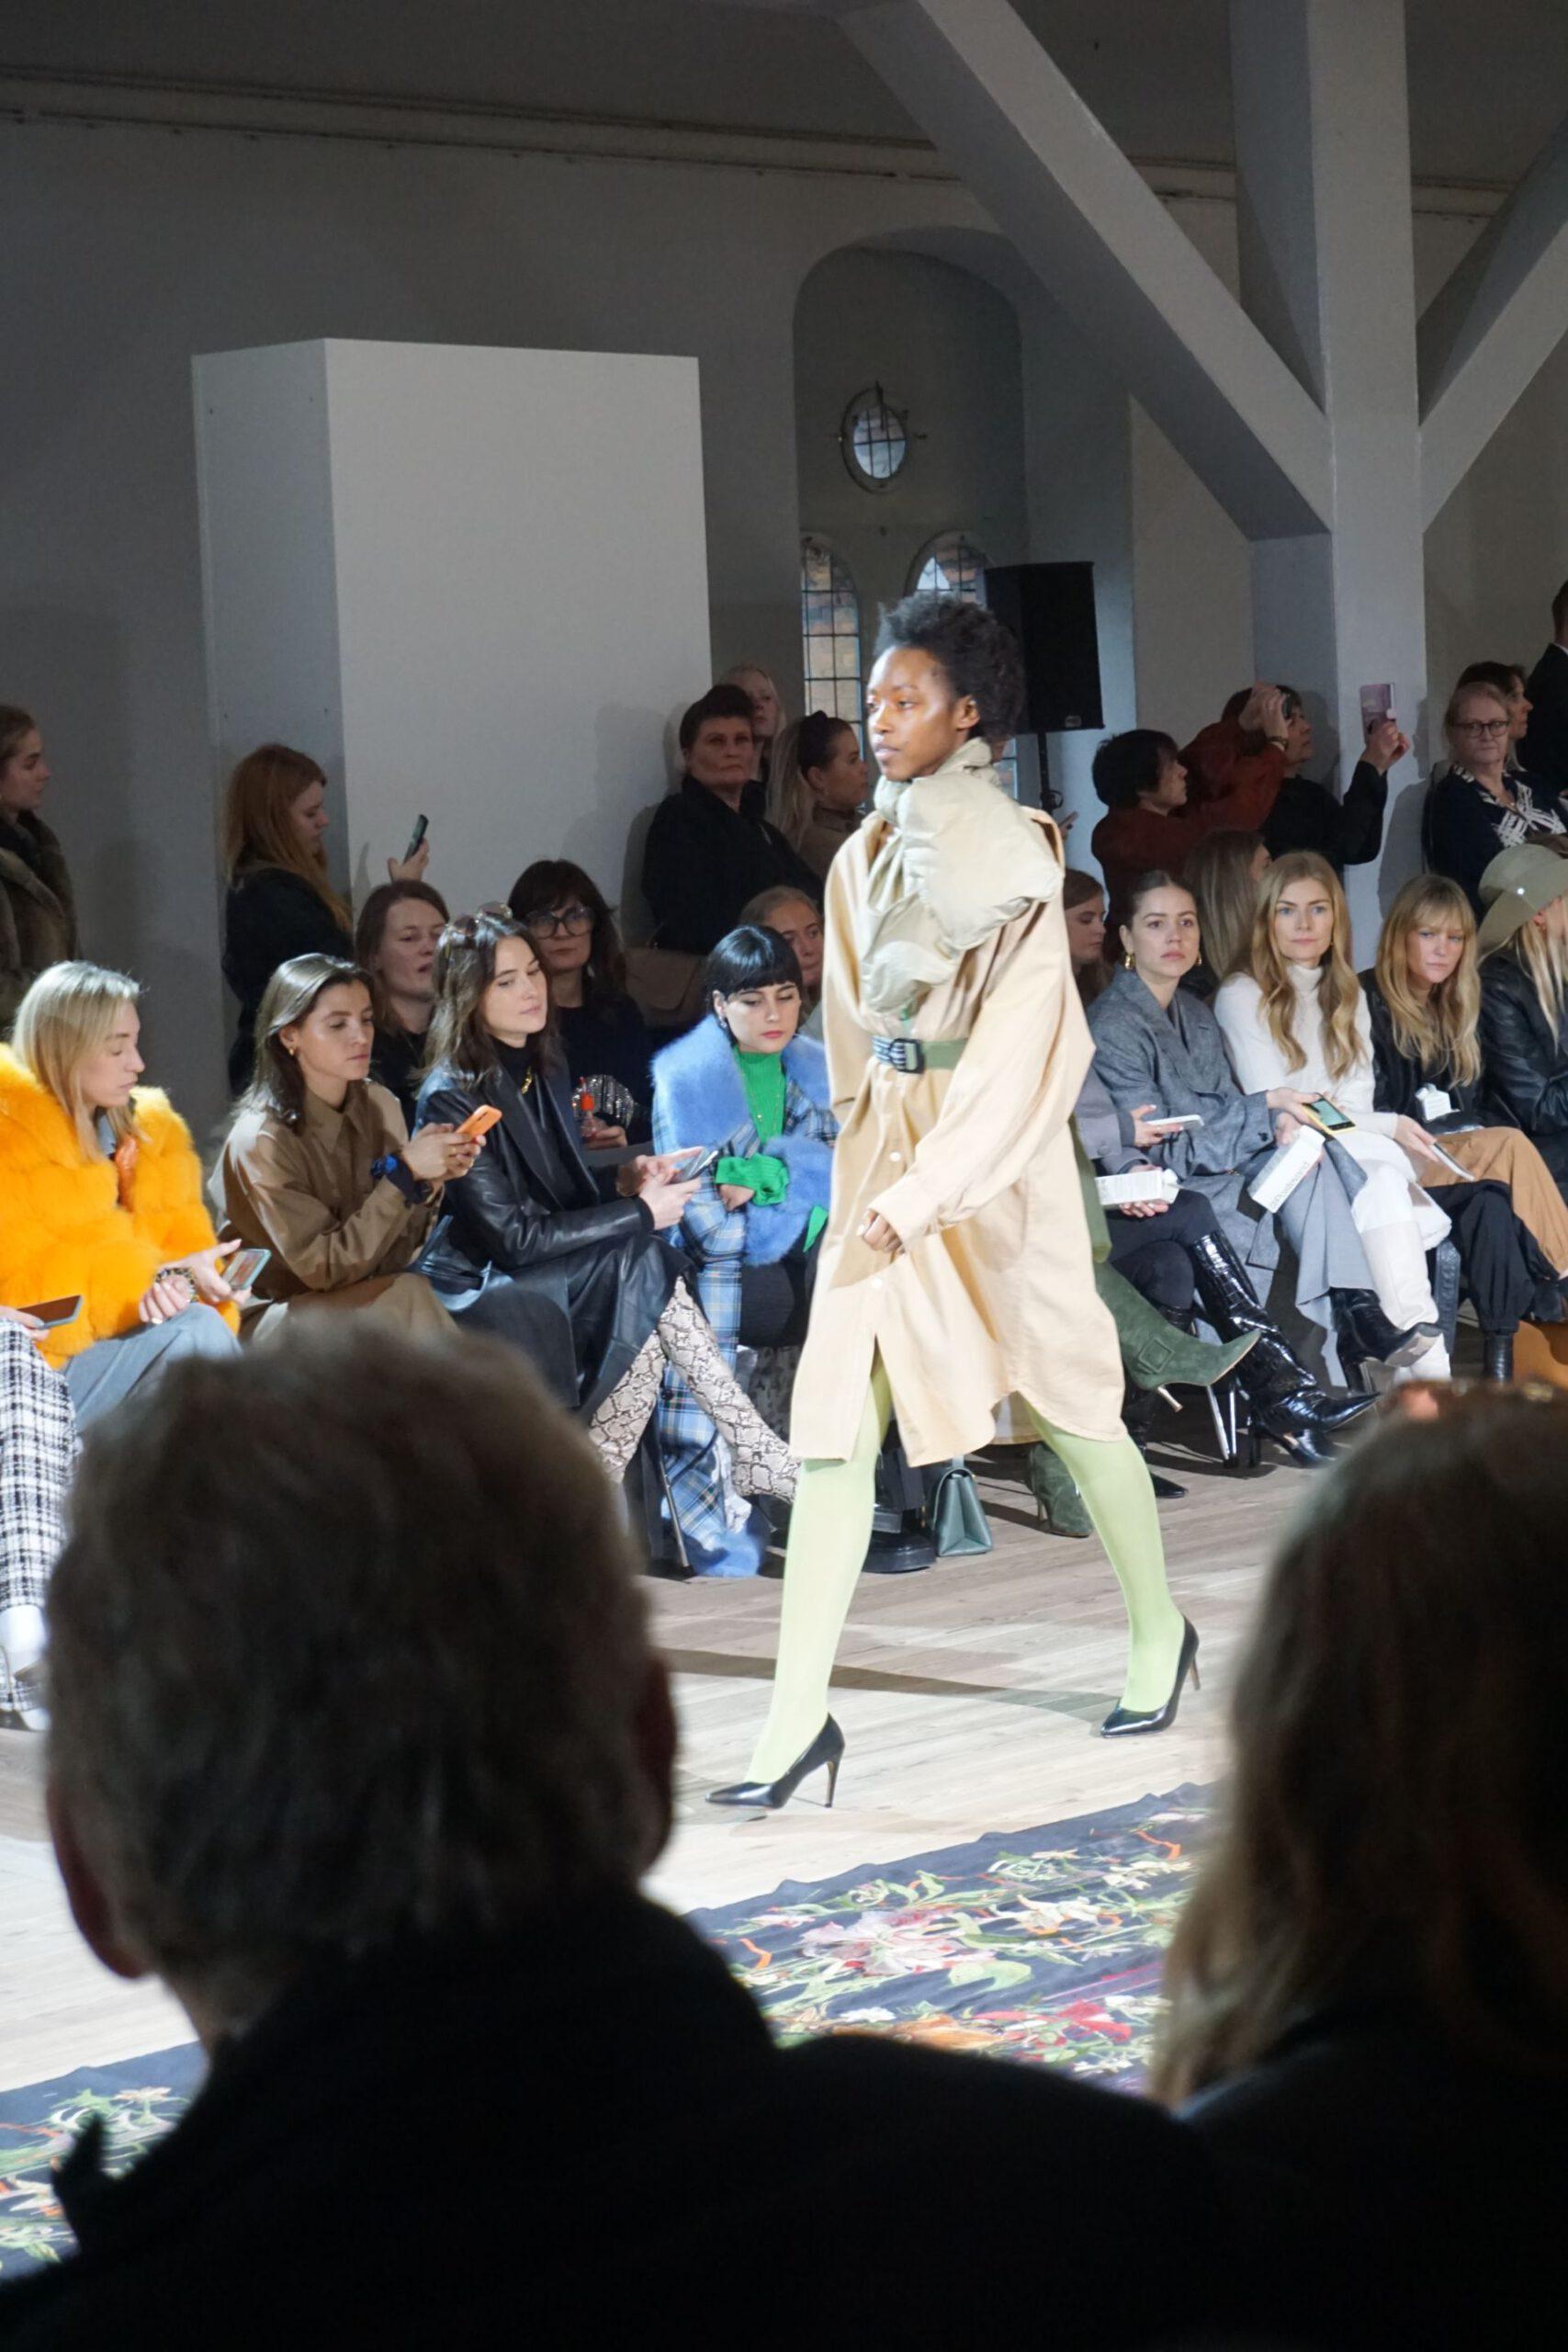 blanche copenhagen fashion show 8